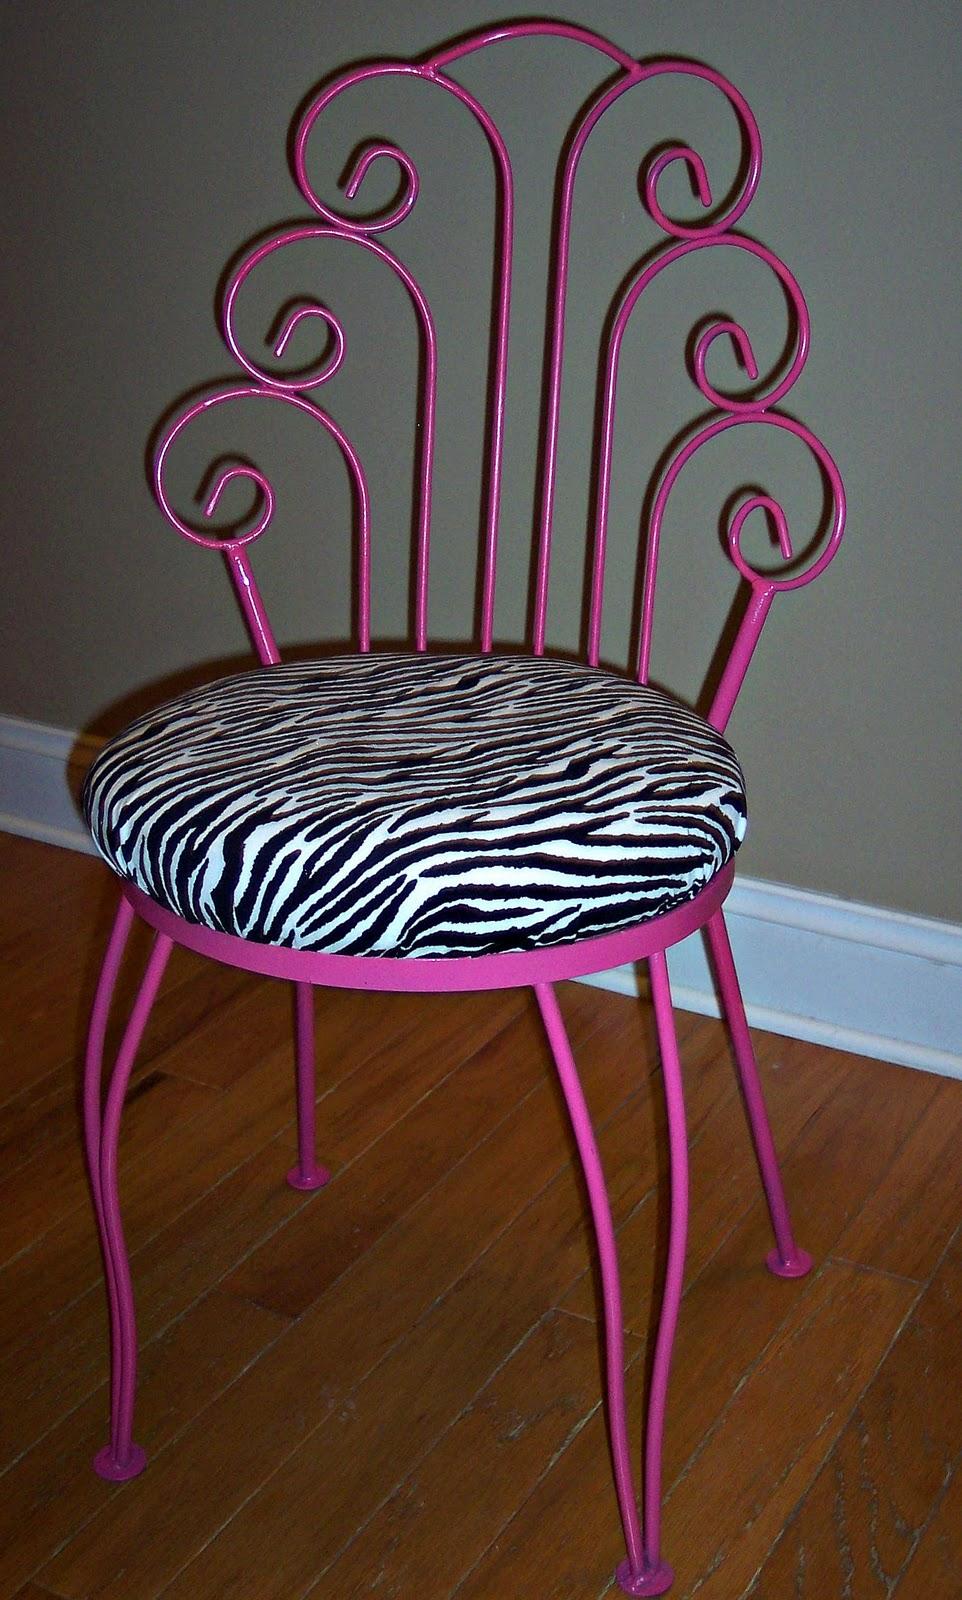 Uniquely chic furniture a little hot pink and zebra print